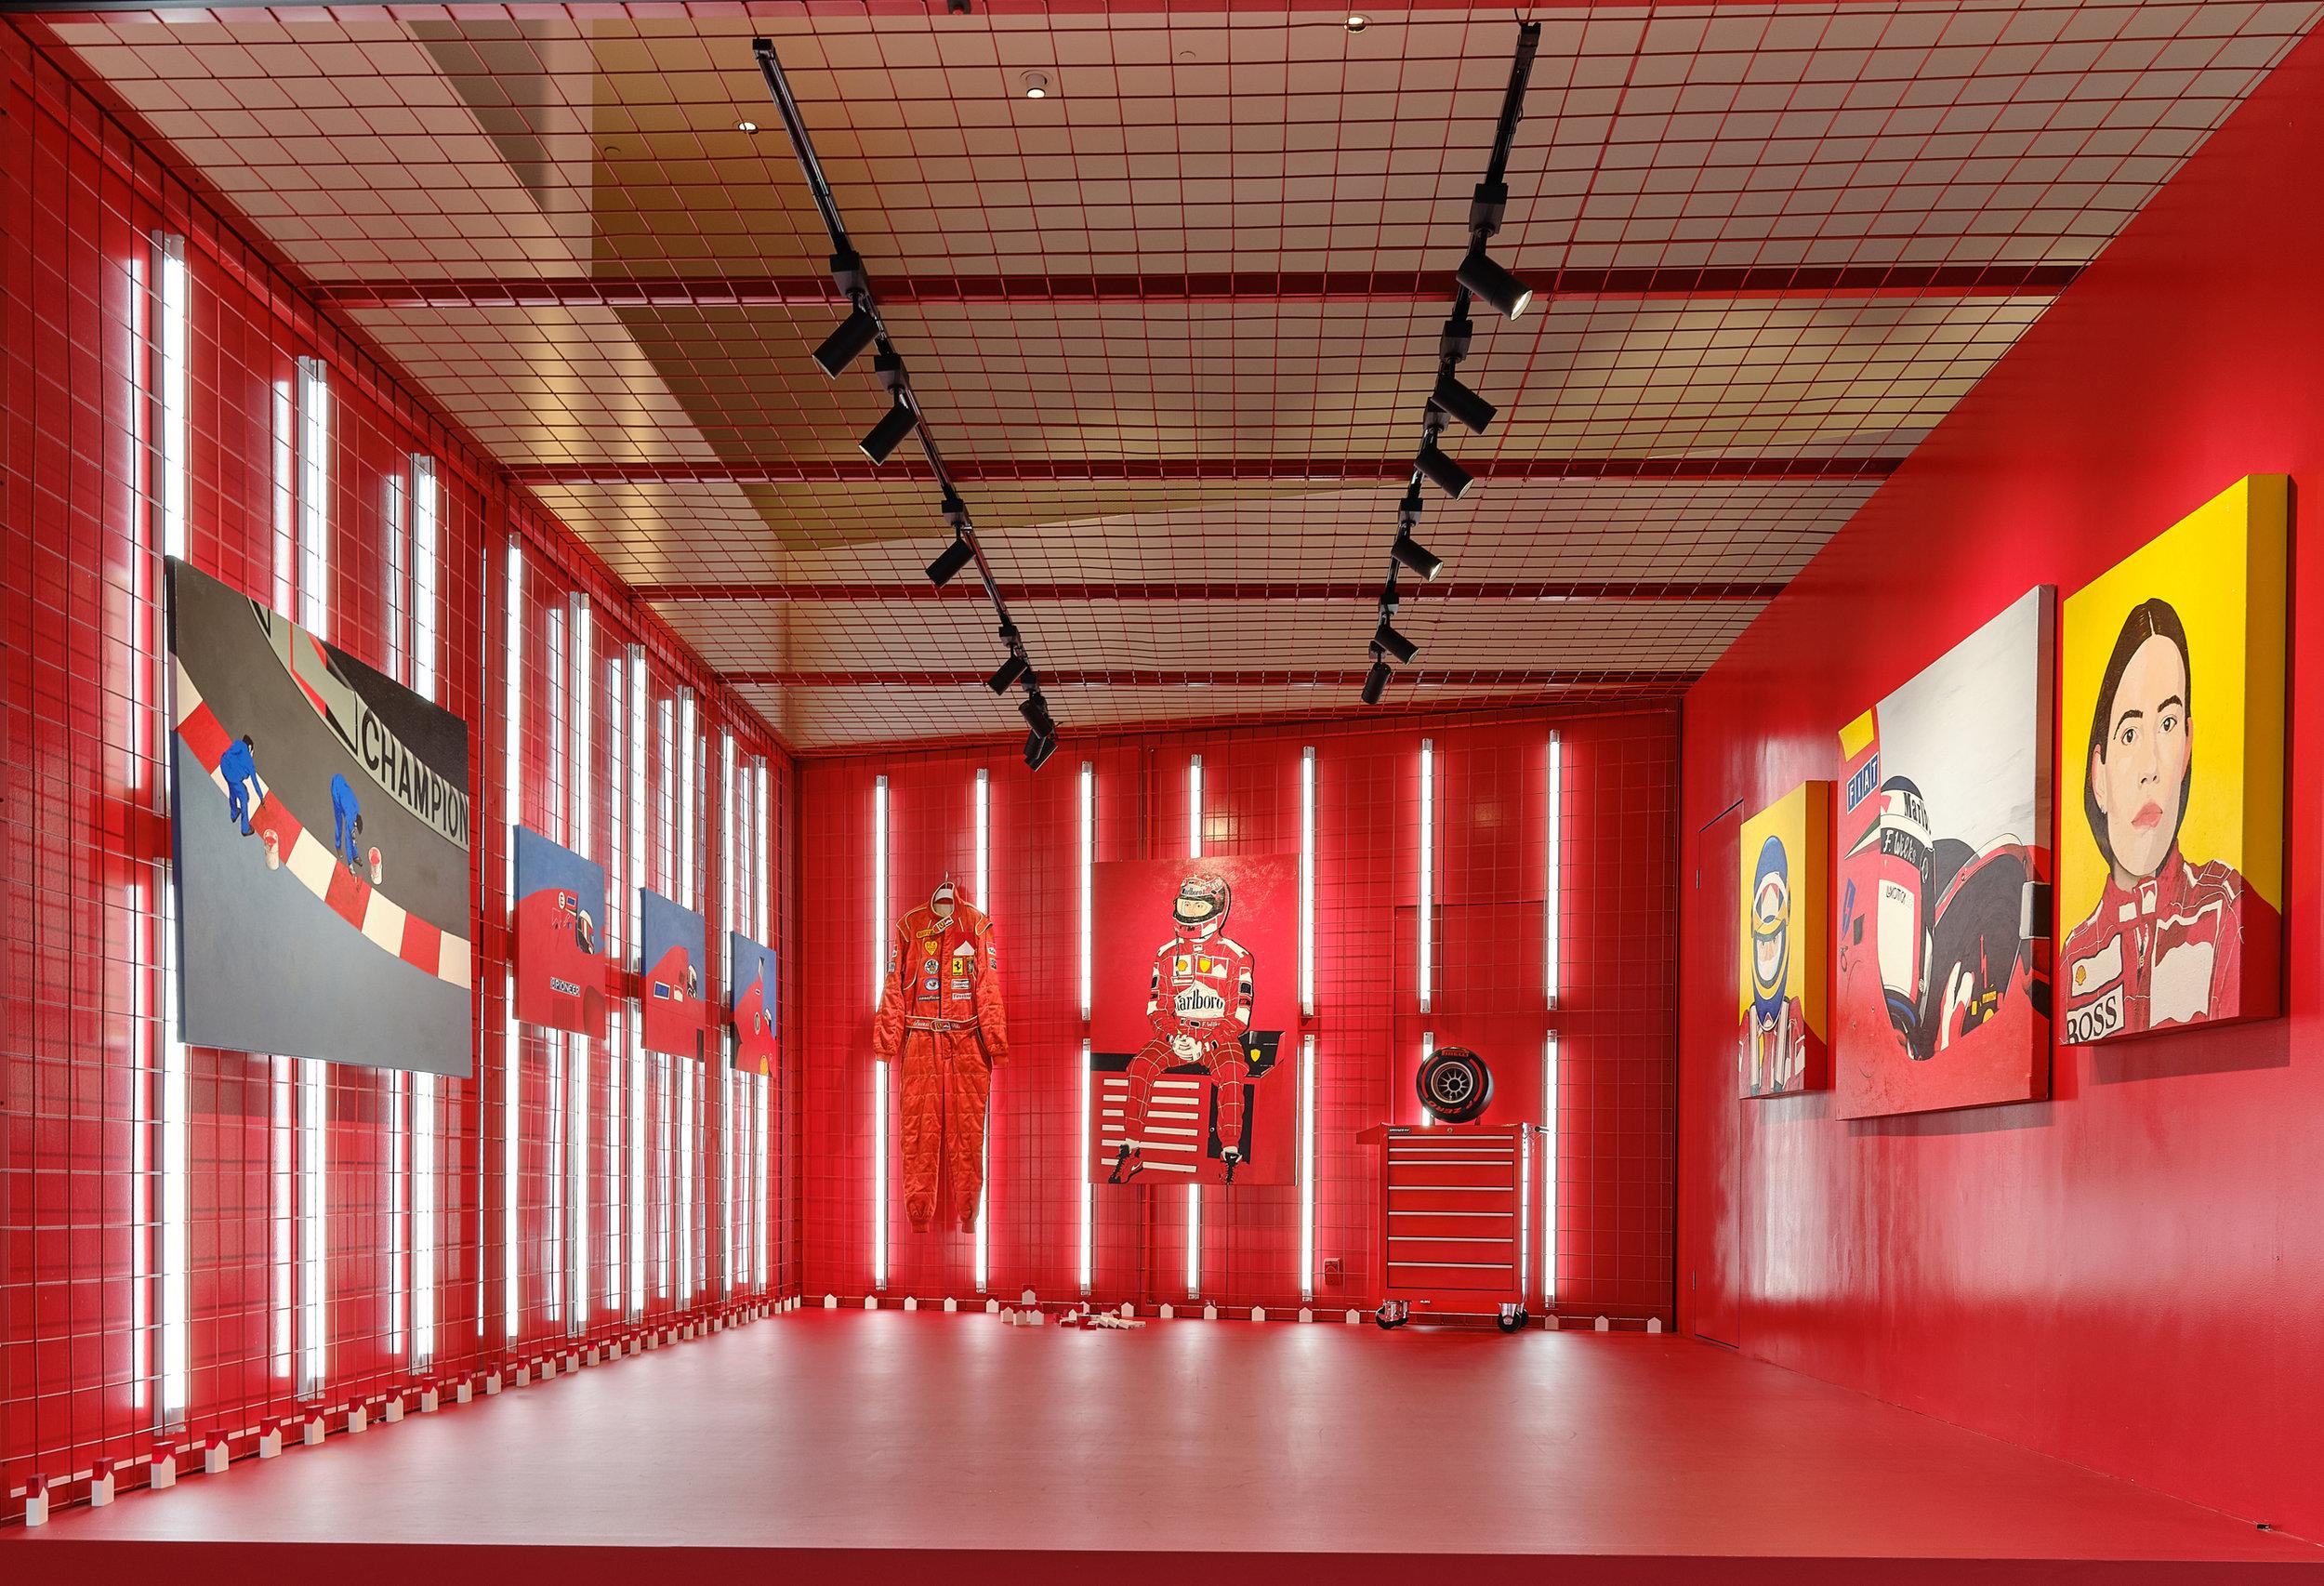 Frances Wilks, TheArsenale, City of Dreams, Macau